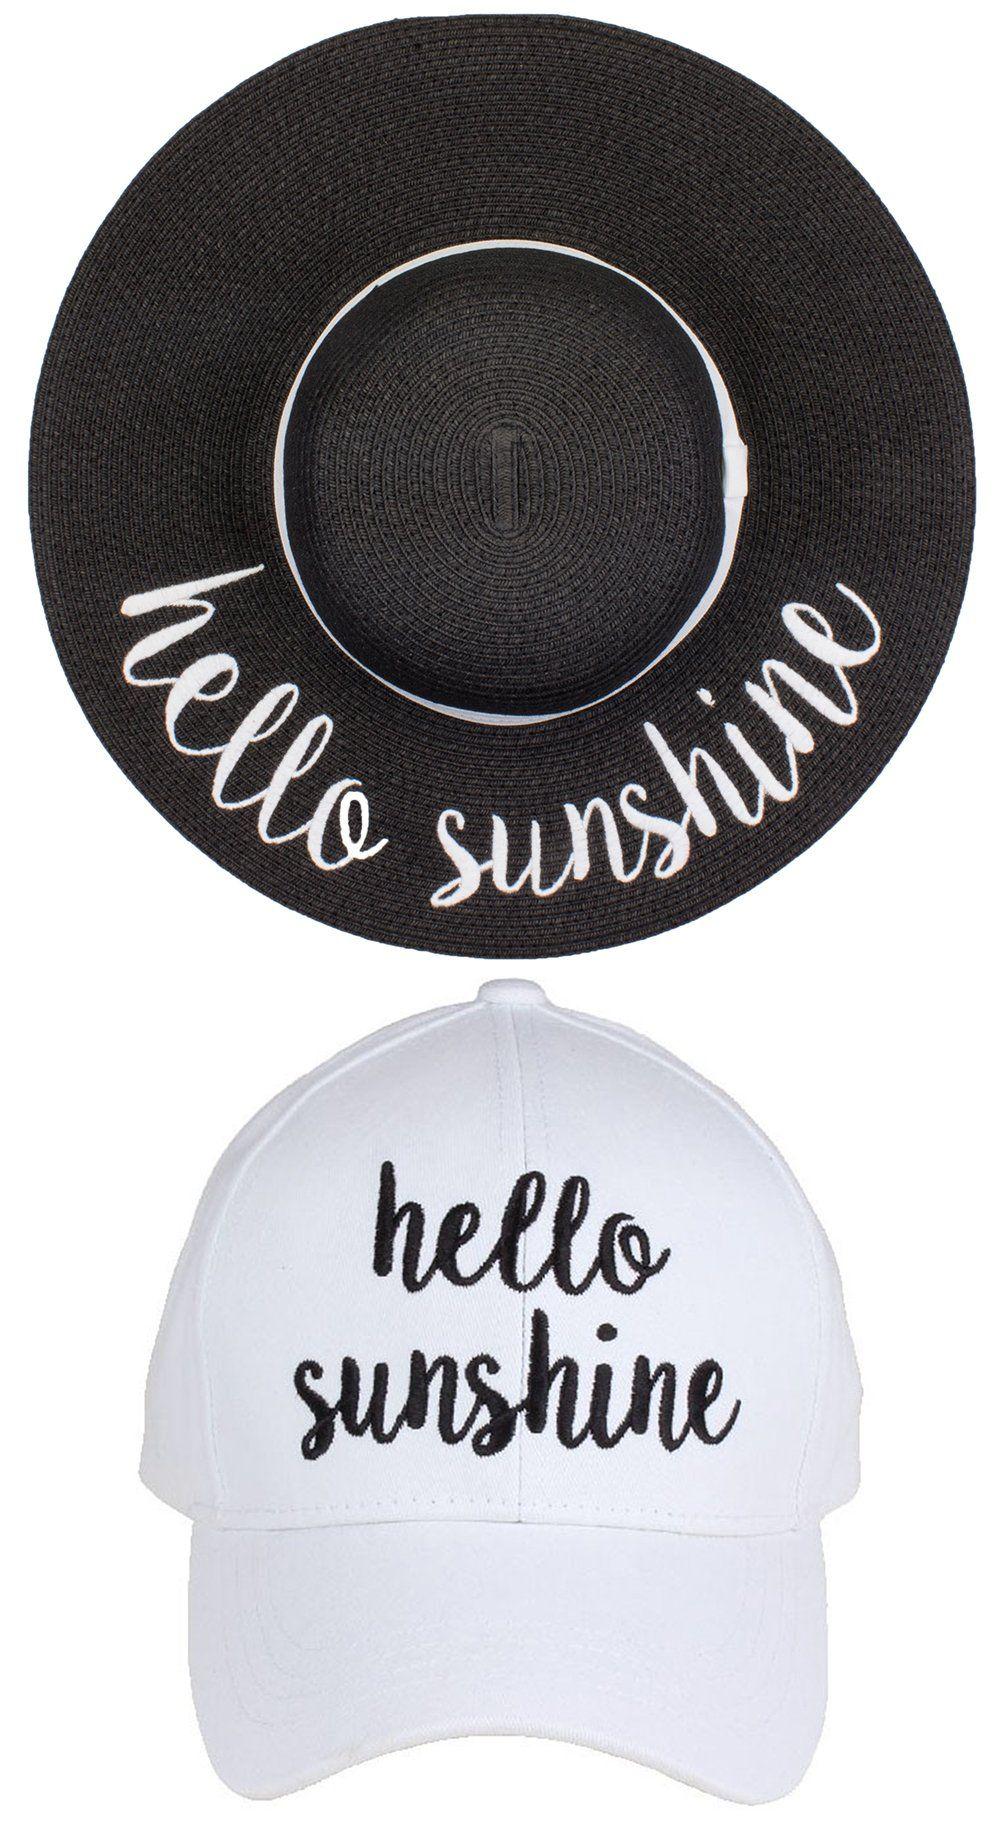 958d7dddca9 C.C Embroidered Baseball Cap   Sun Hat Bundle - Hello Sunshine (Black Sun  Hat